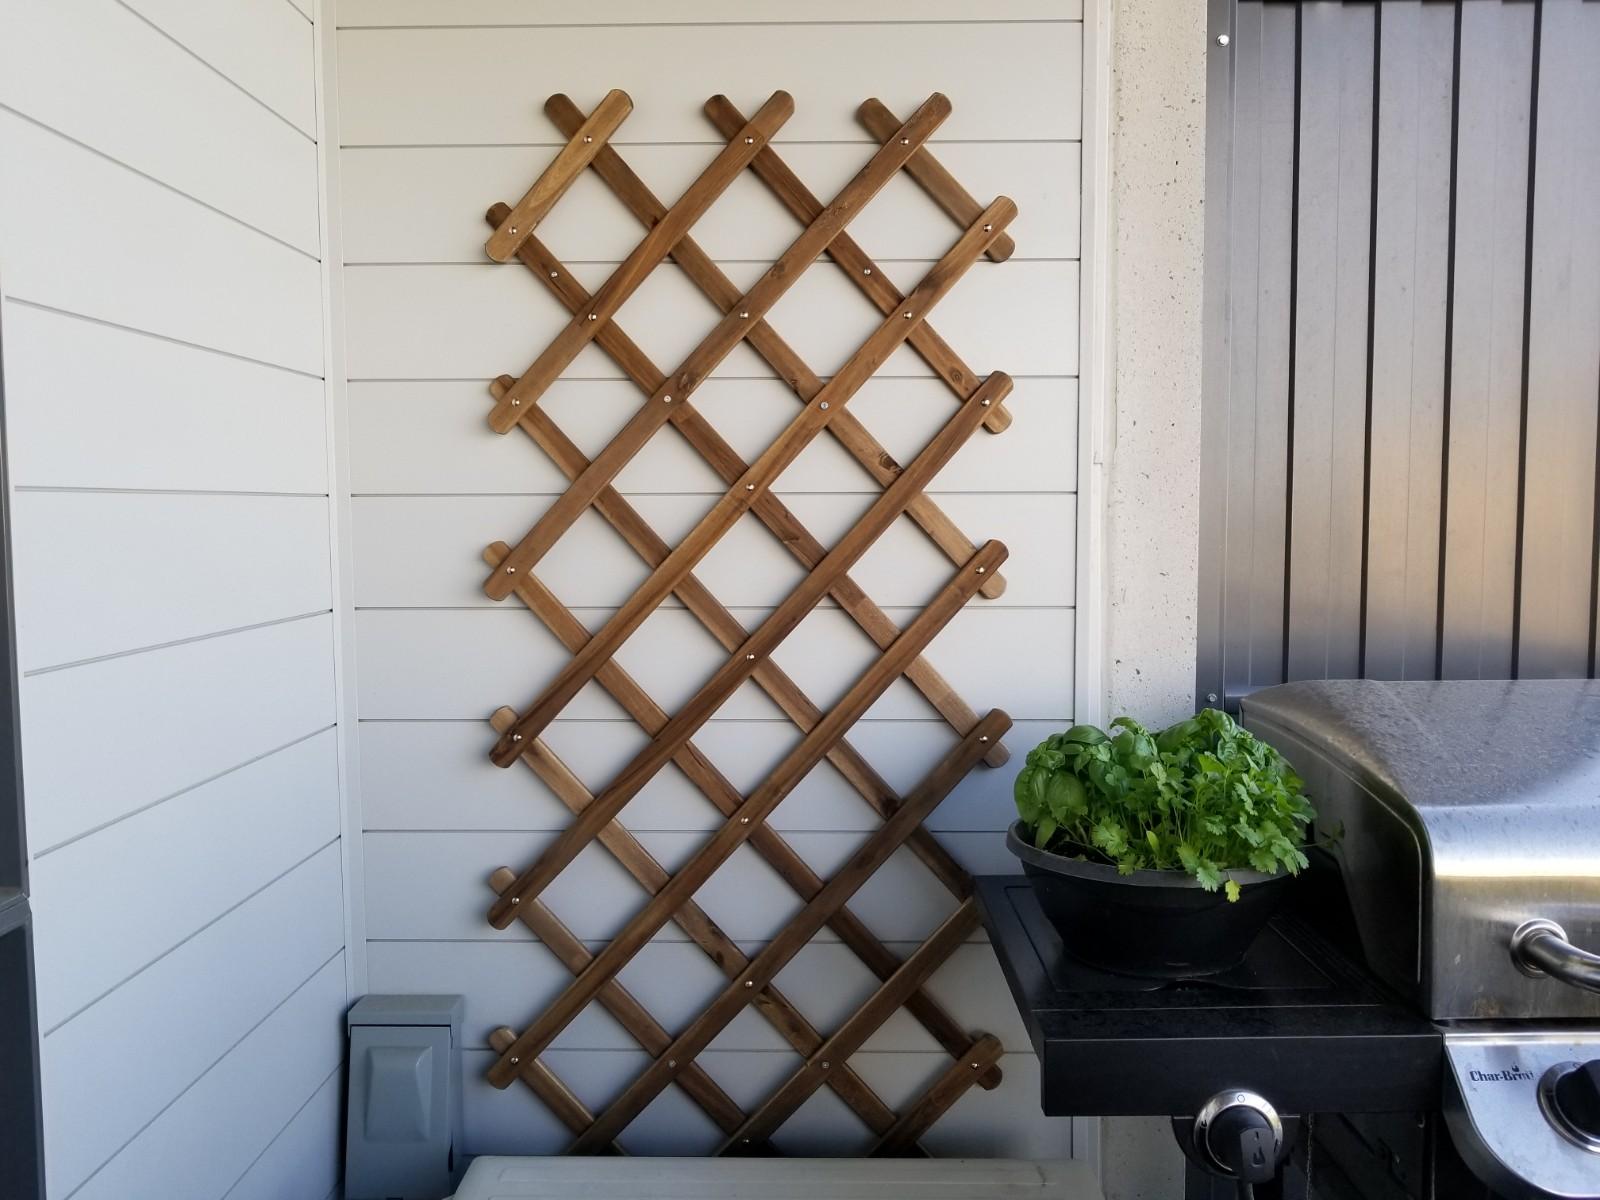 balcony garden ideas how to plant an